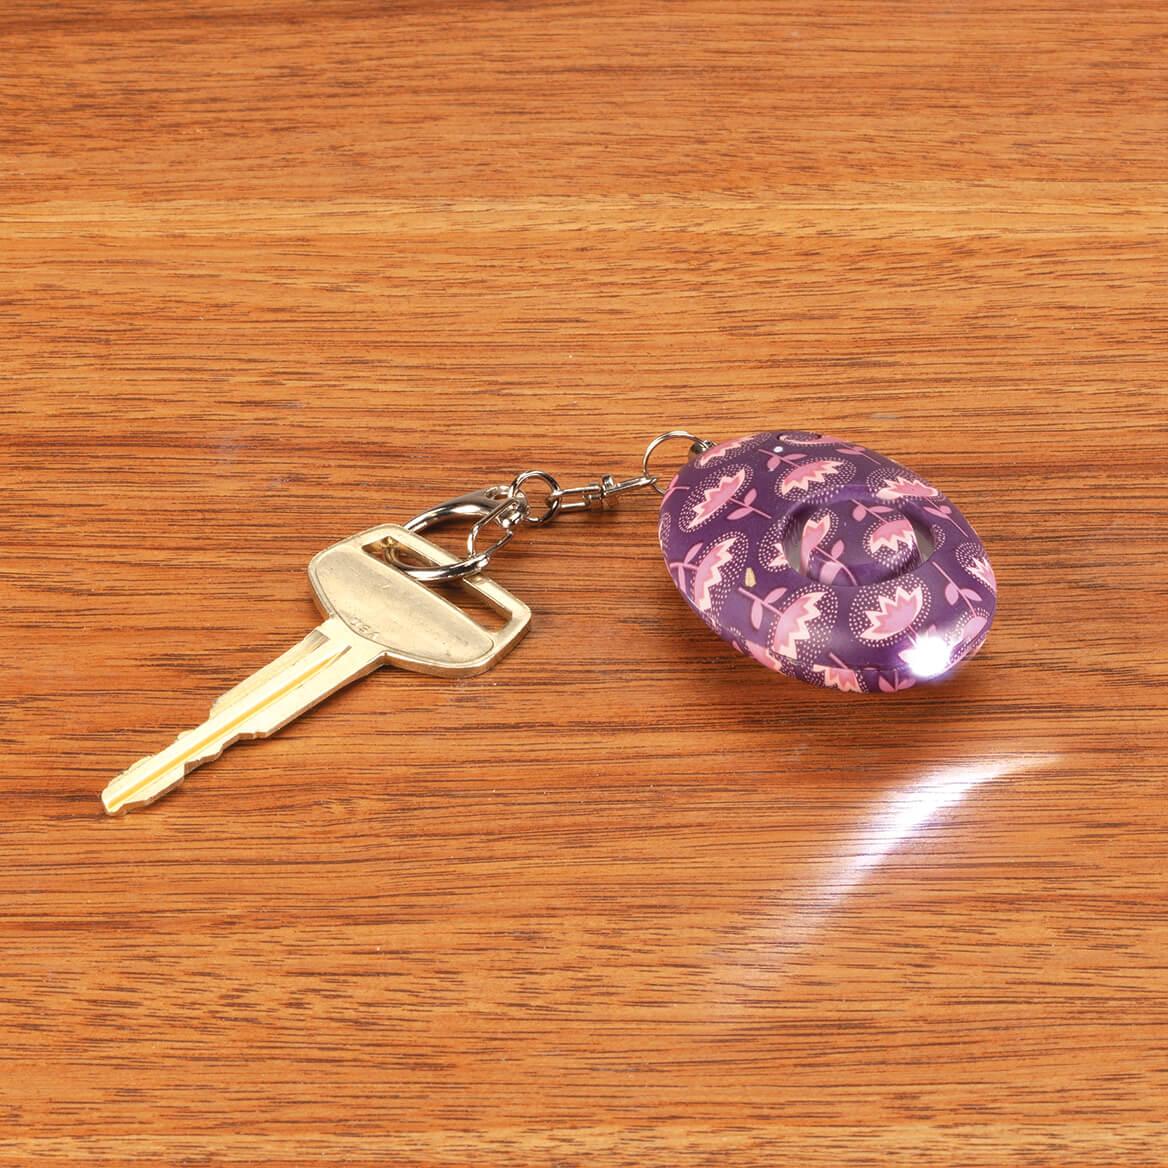 Mini Key Chain LED Flashlight & Alarm-370560